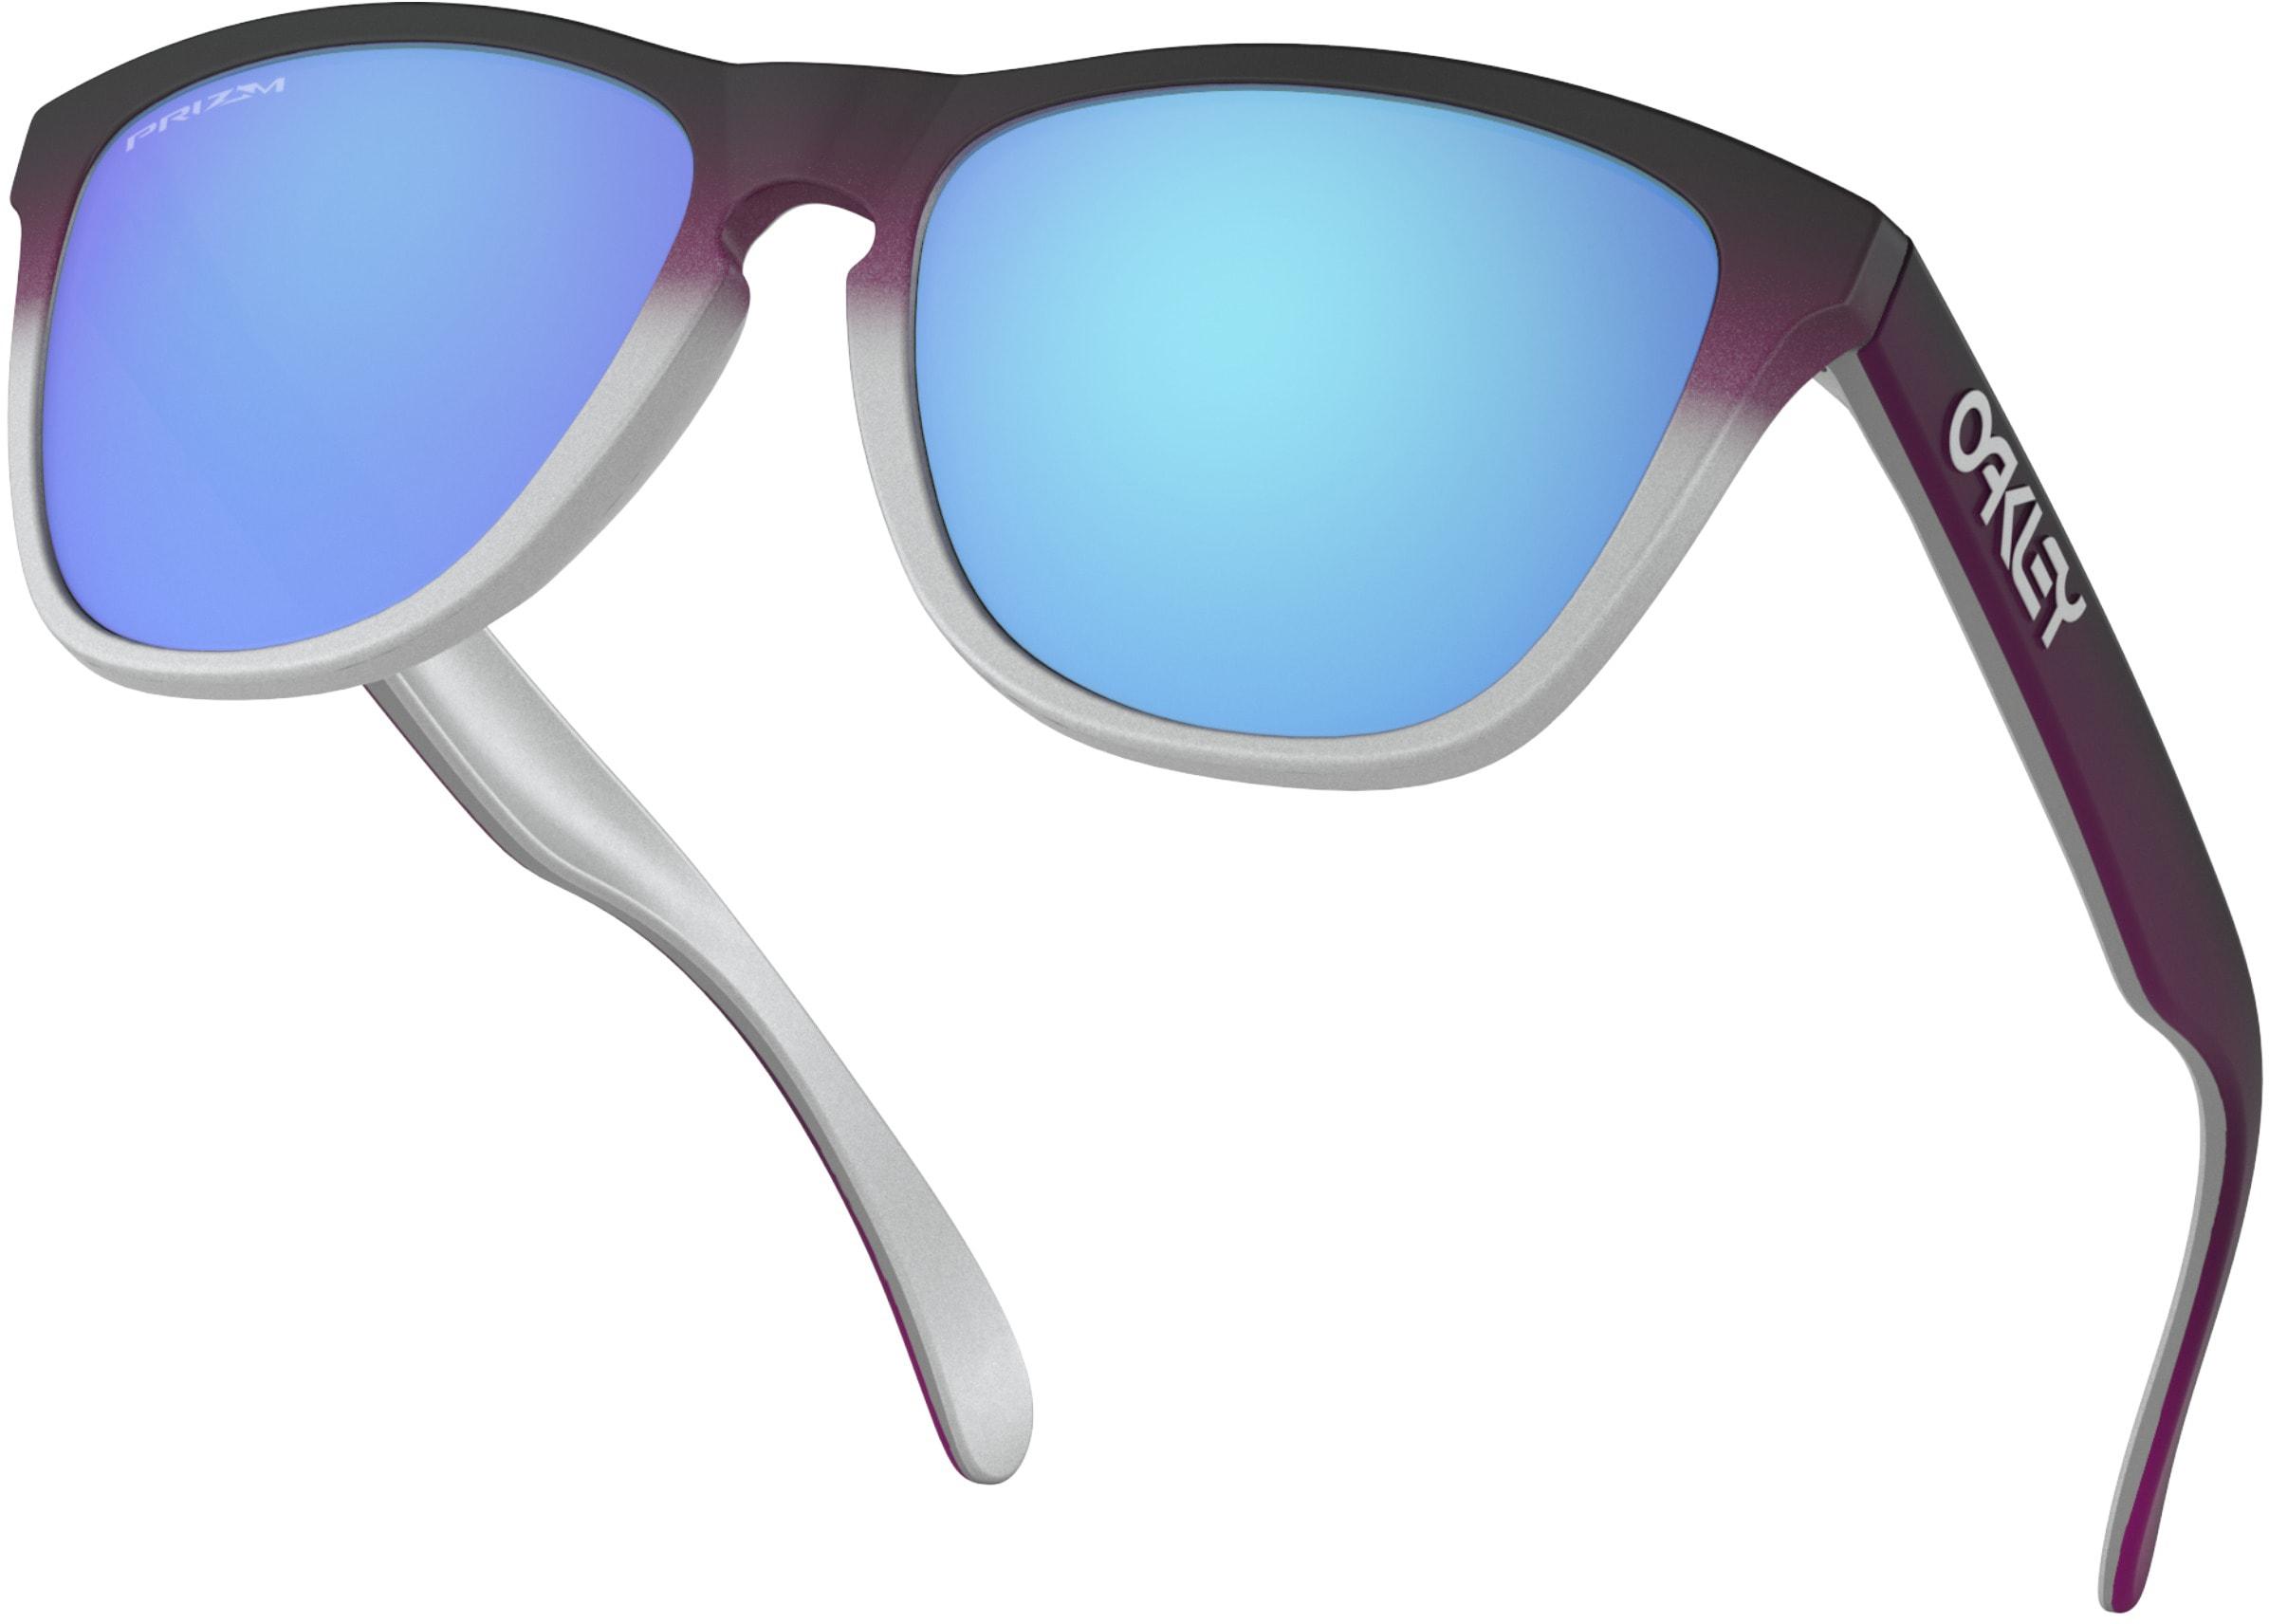 1ee94043f5 Oakley Frogskins Splatterfade Collection Sunglasses - thumbnail 5